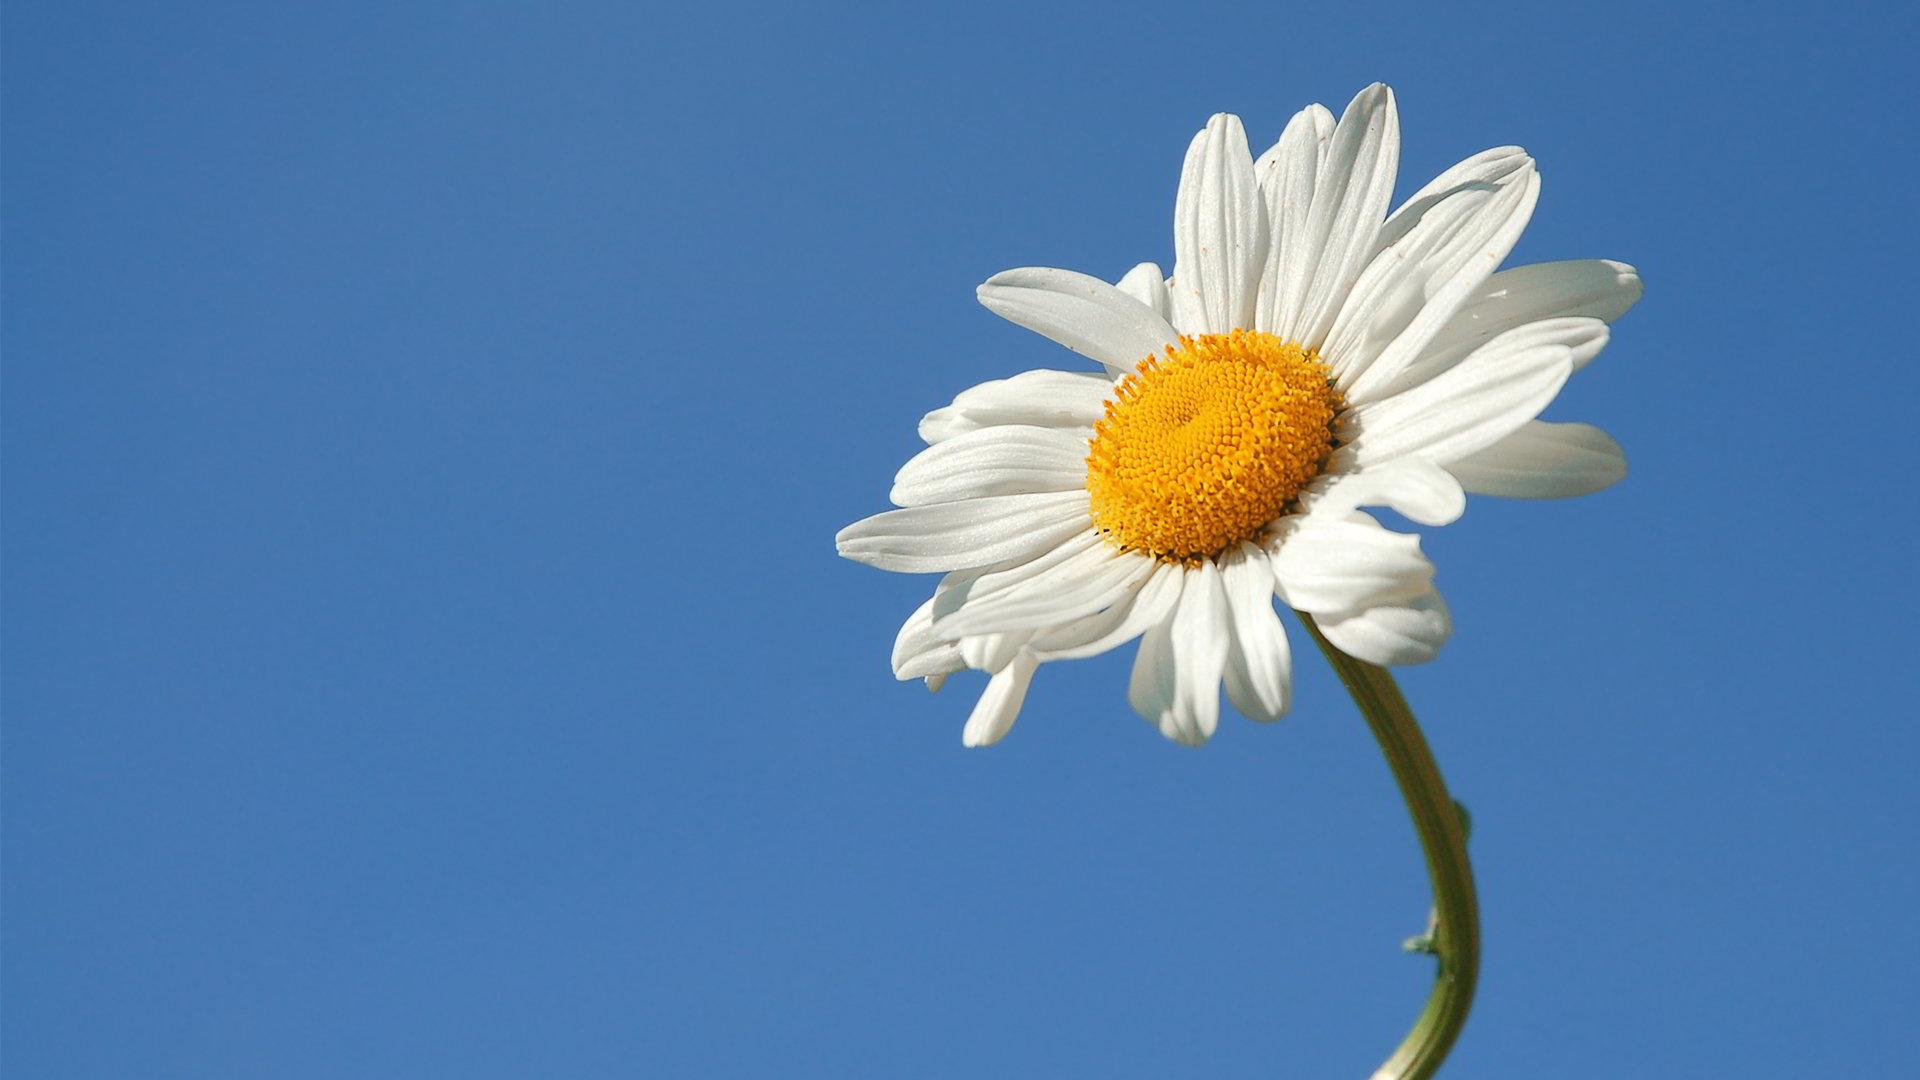 hinh anh hoa cuc dep 16